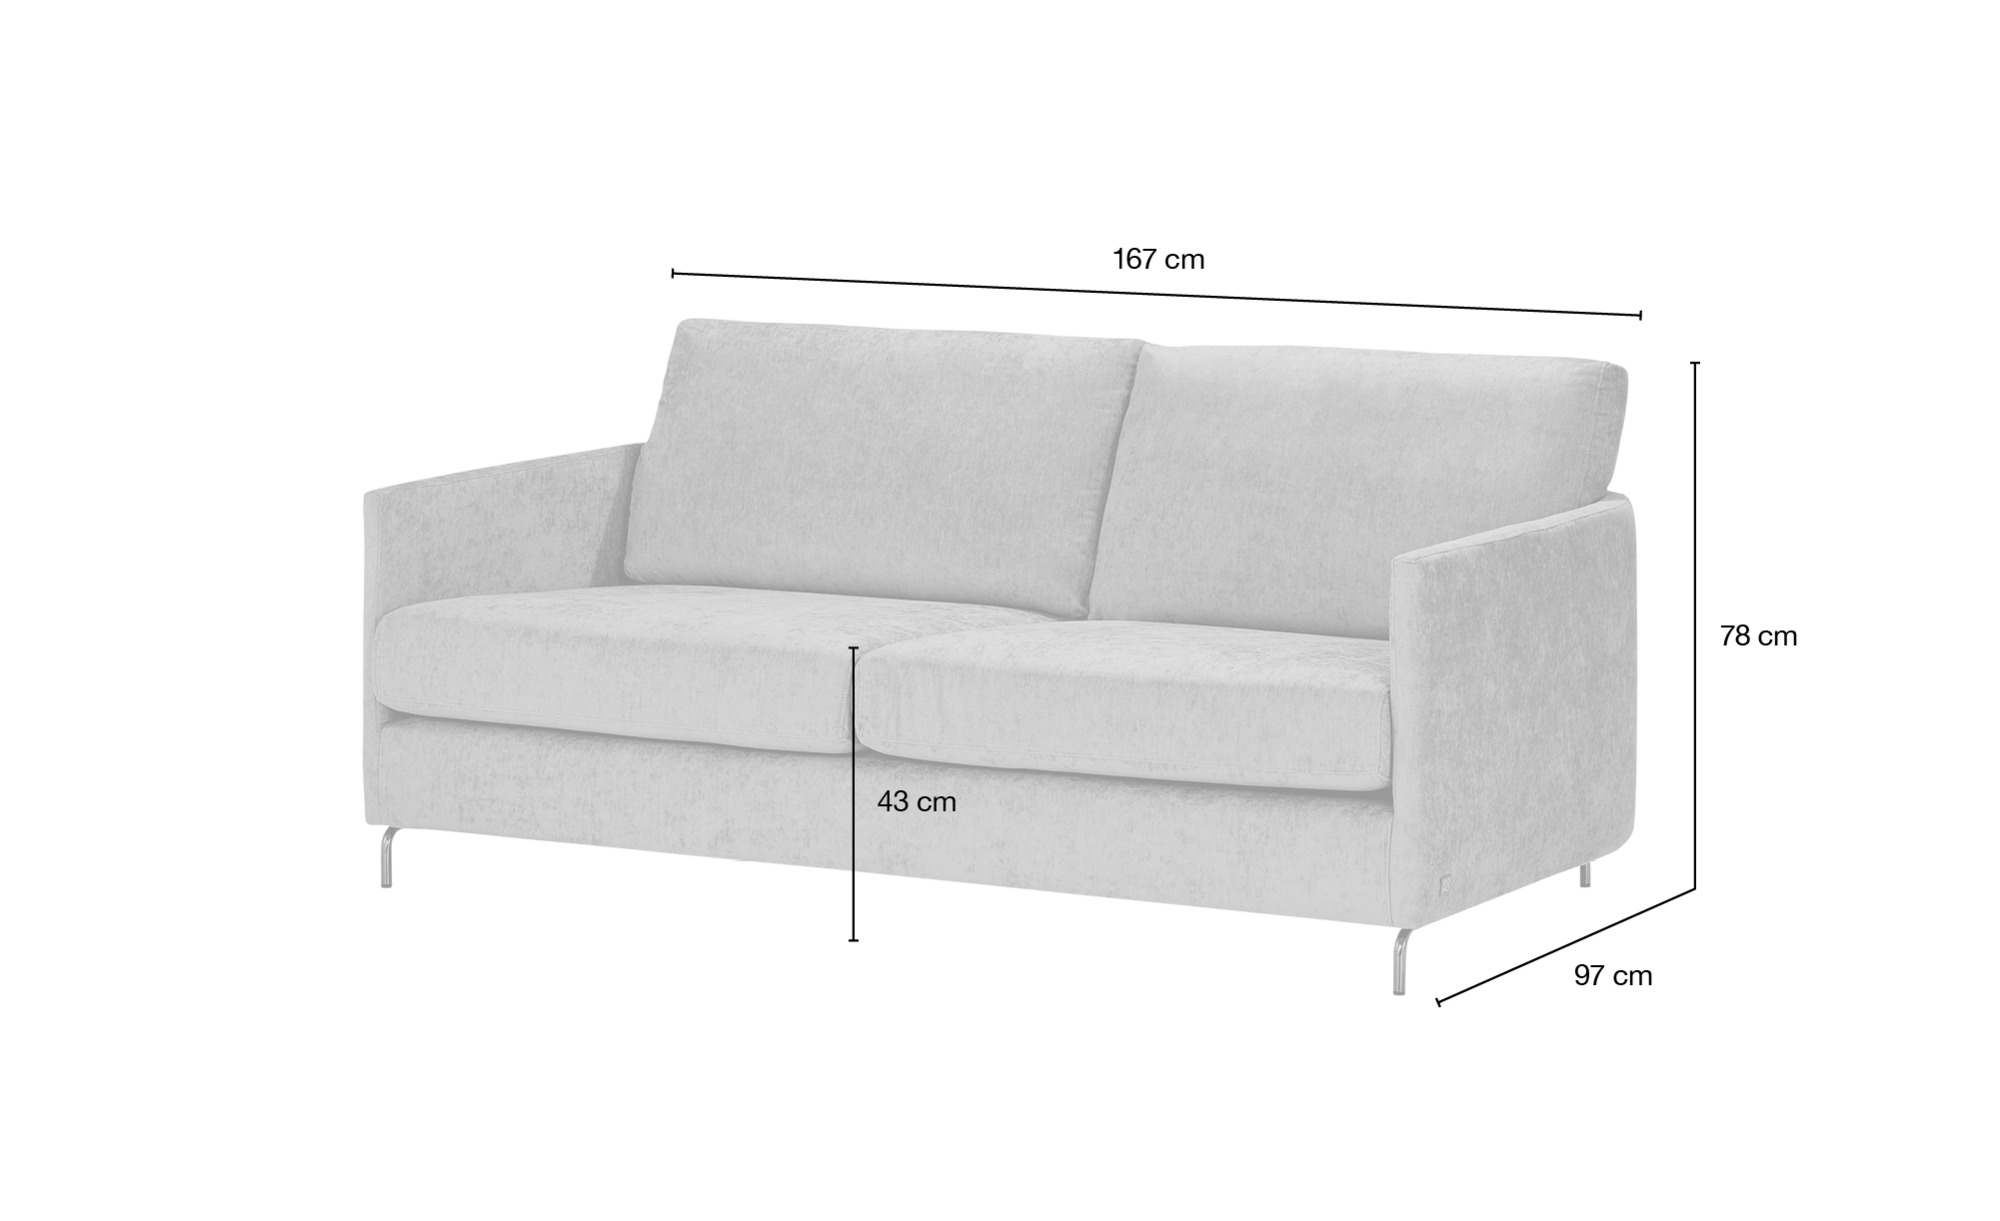 SOHO Sofa  Harriet Day ¦ grau ¦ Maße (cm): B: 167 H: 78 T: 97 Polstermöbel > Sofas > 2-Sitzer - Höffner